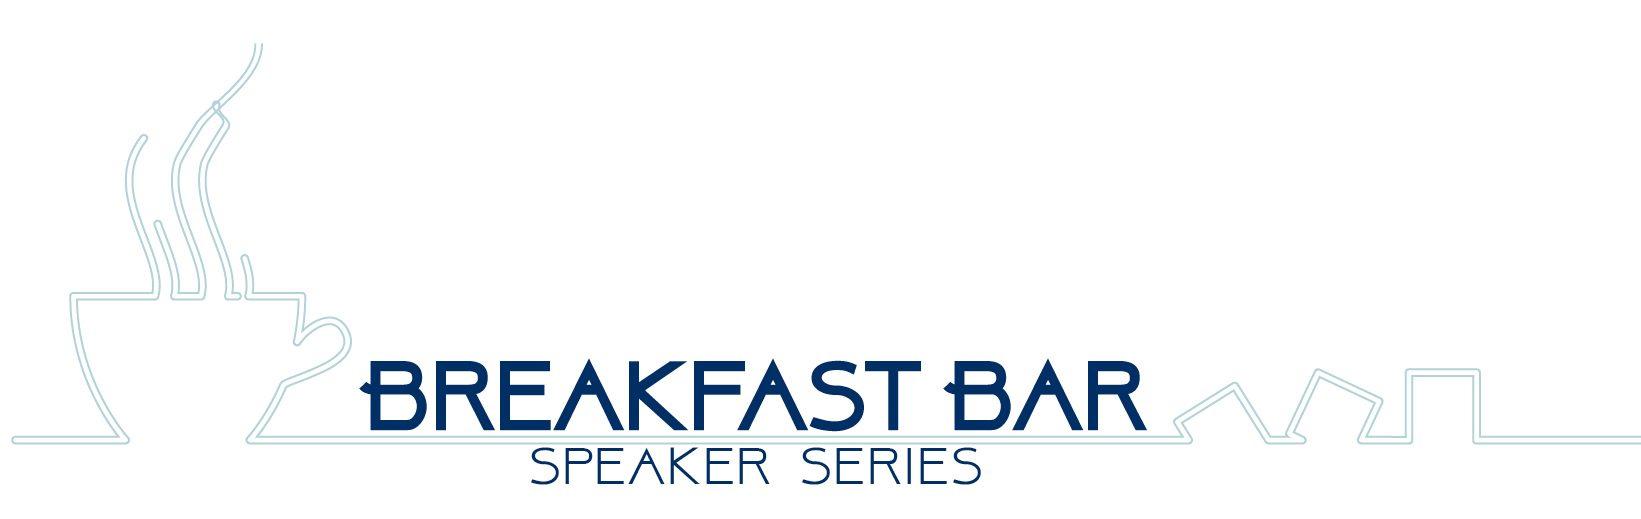 breakfastbar_091317b